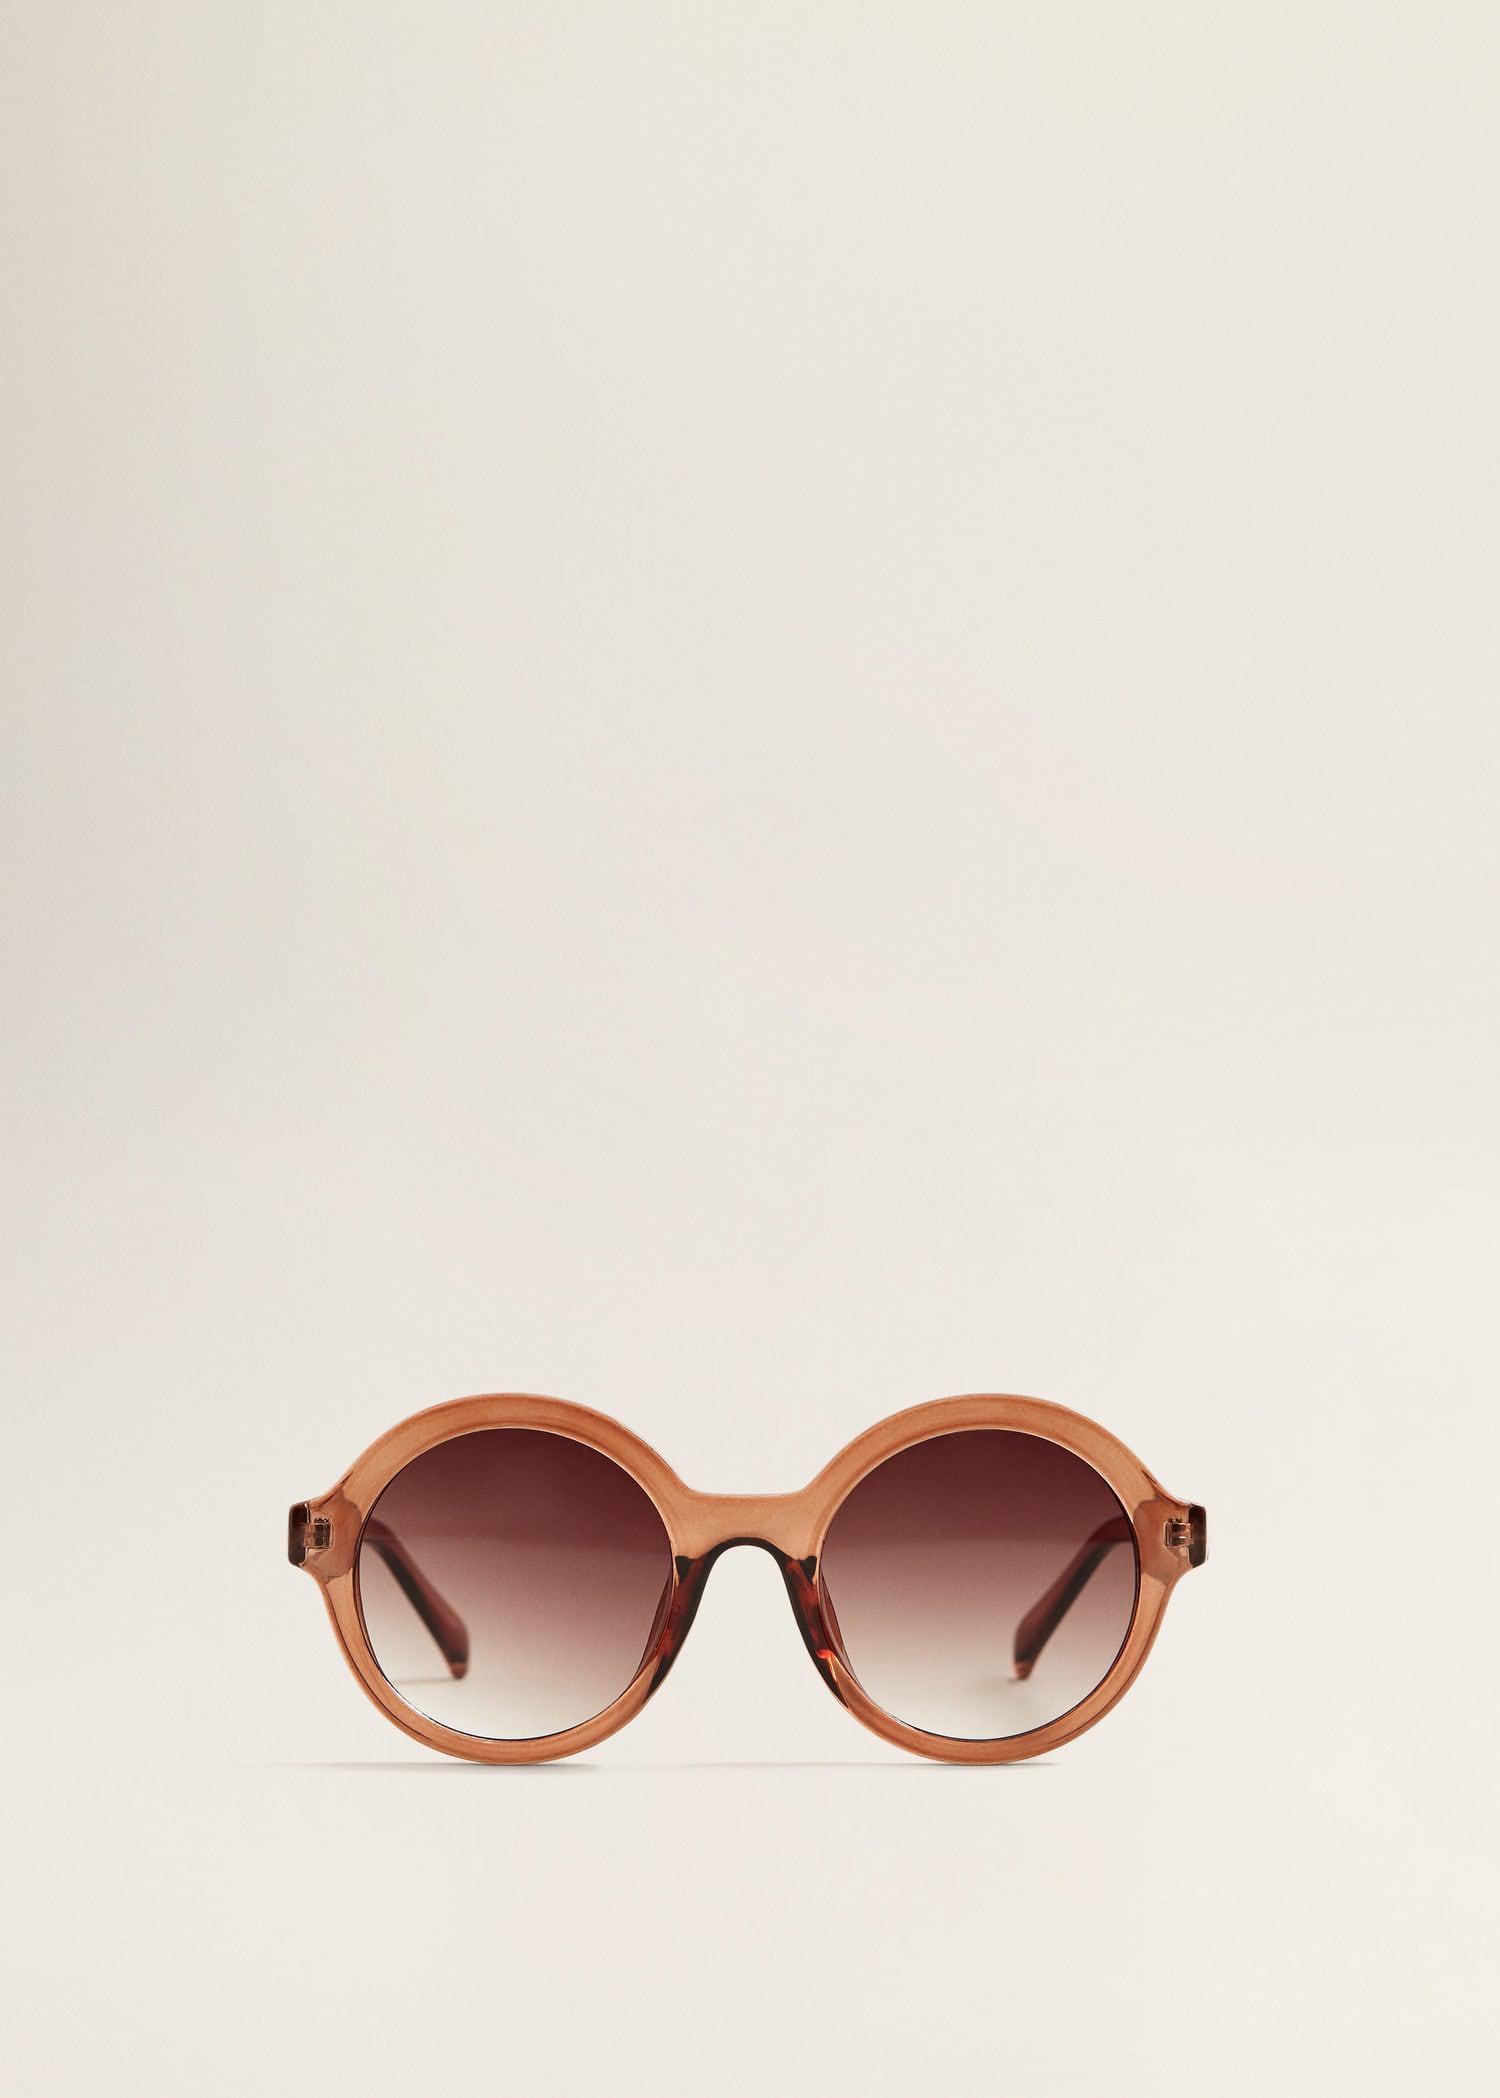 Mango Retro Style Sunglasses in Pink